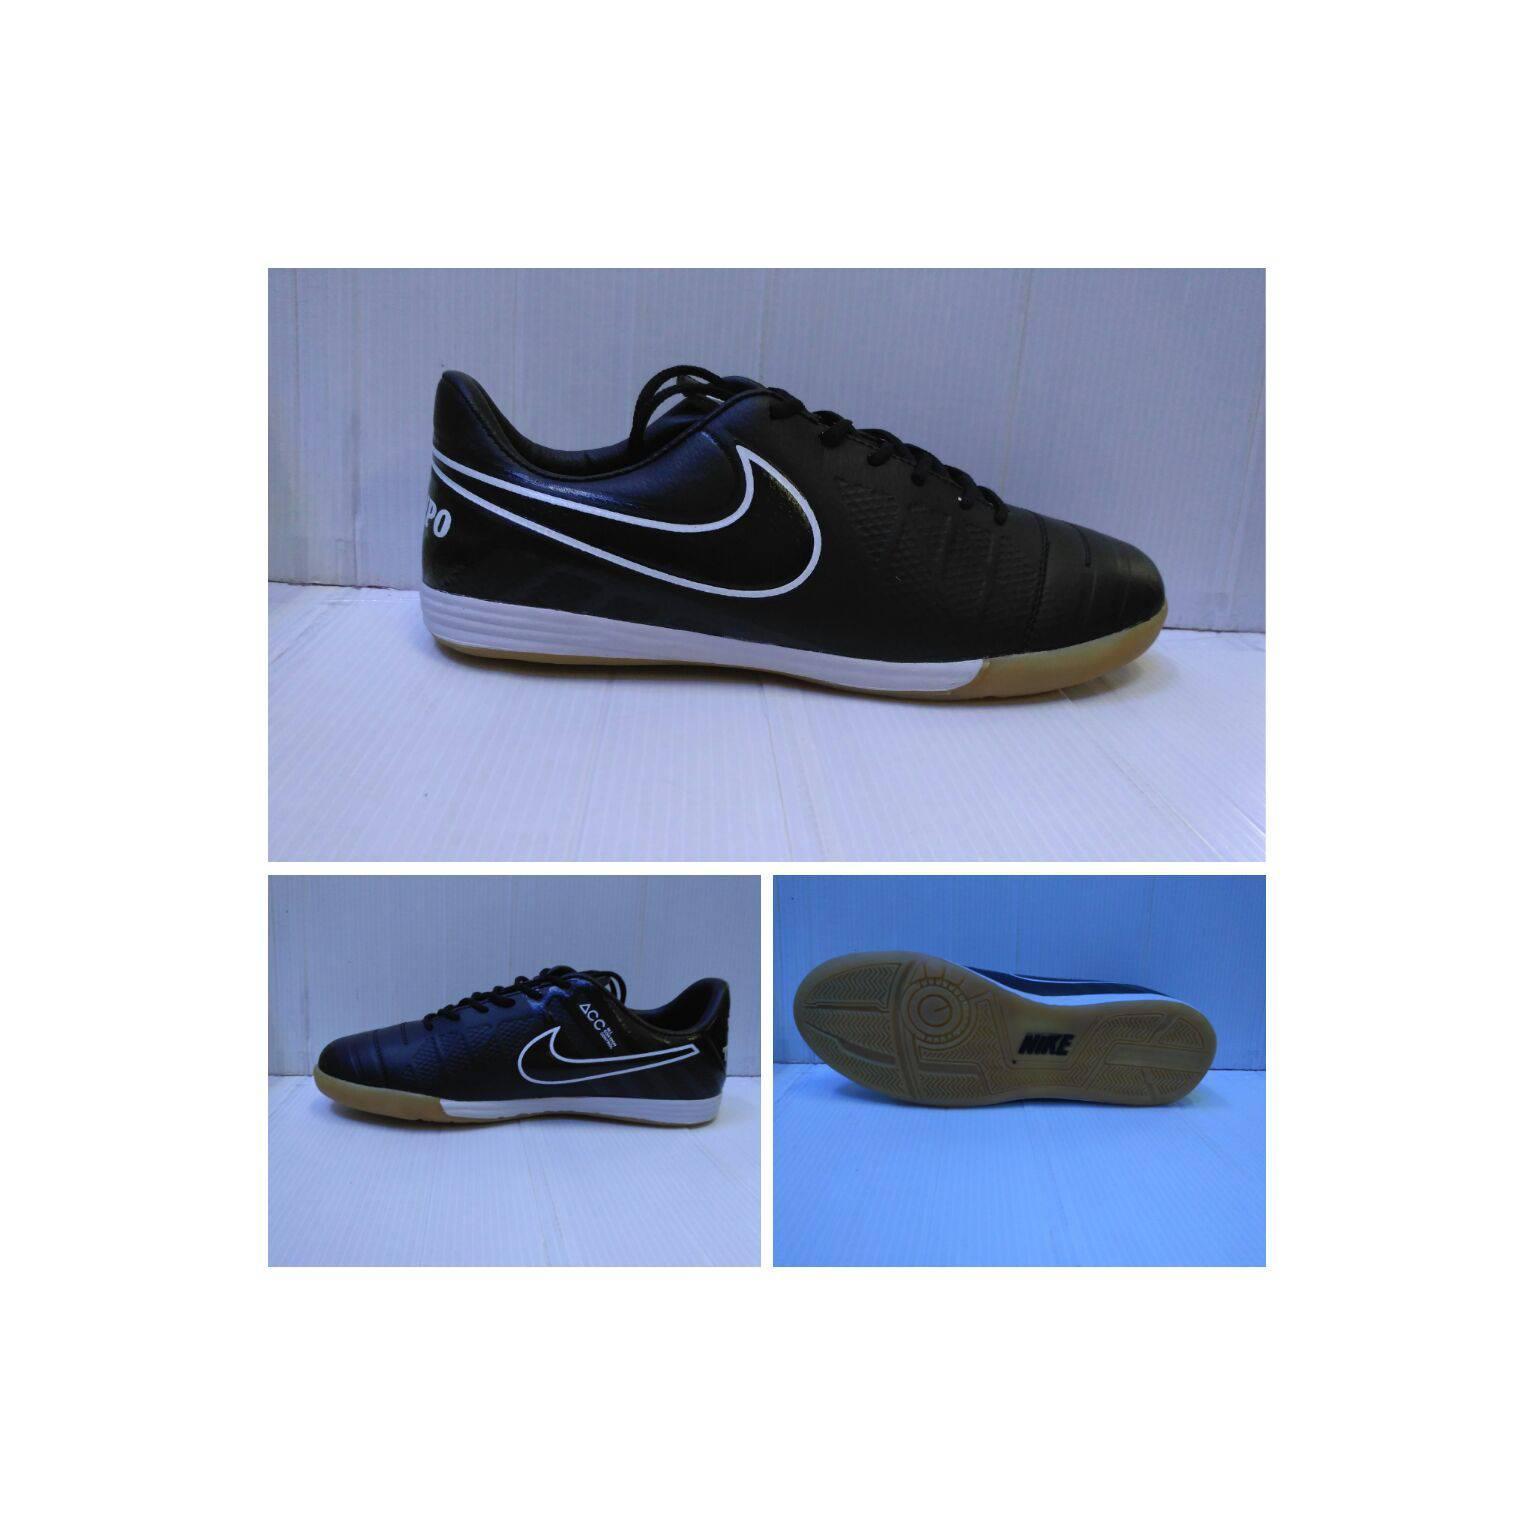 Sepatu futsal nike tiempo hitam list putih sol karet